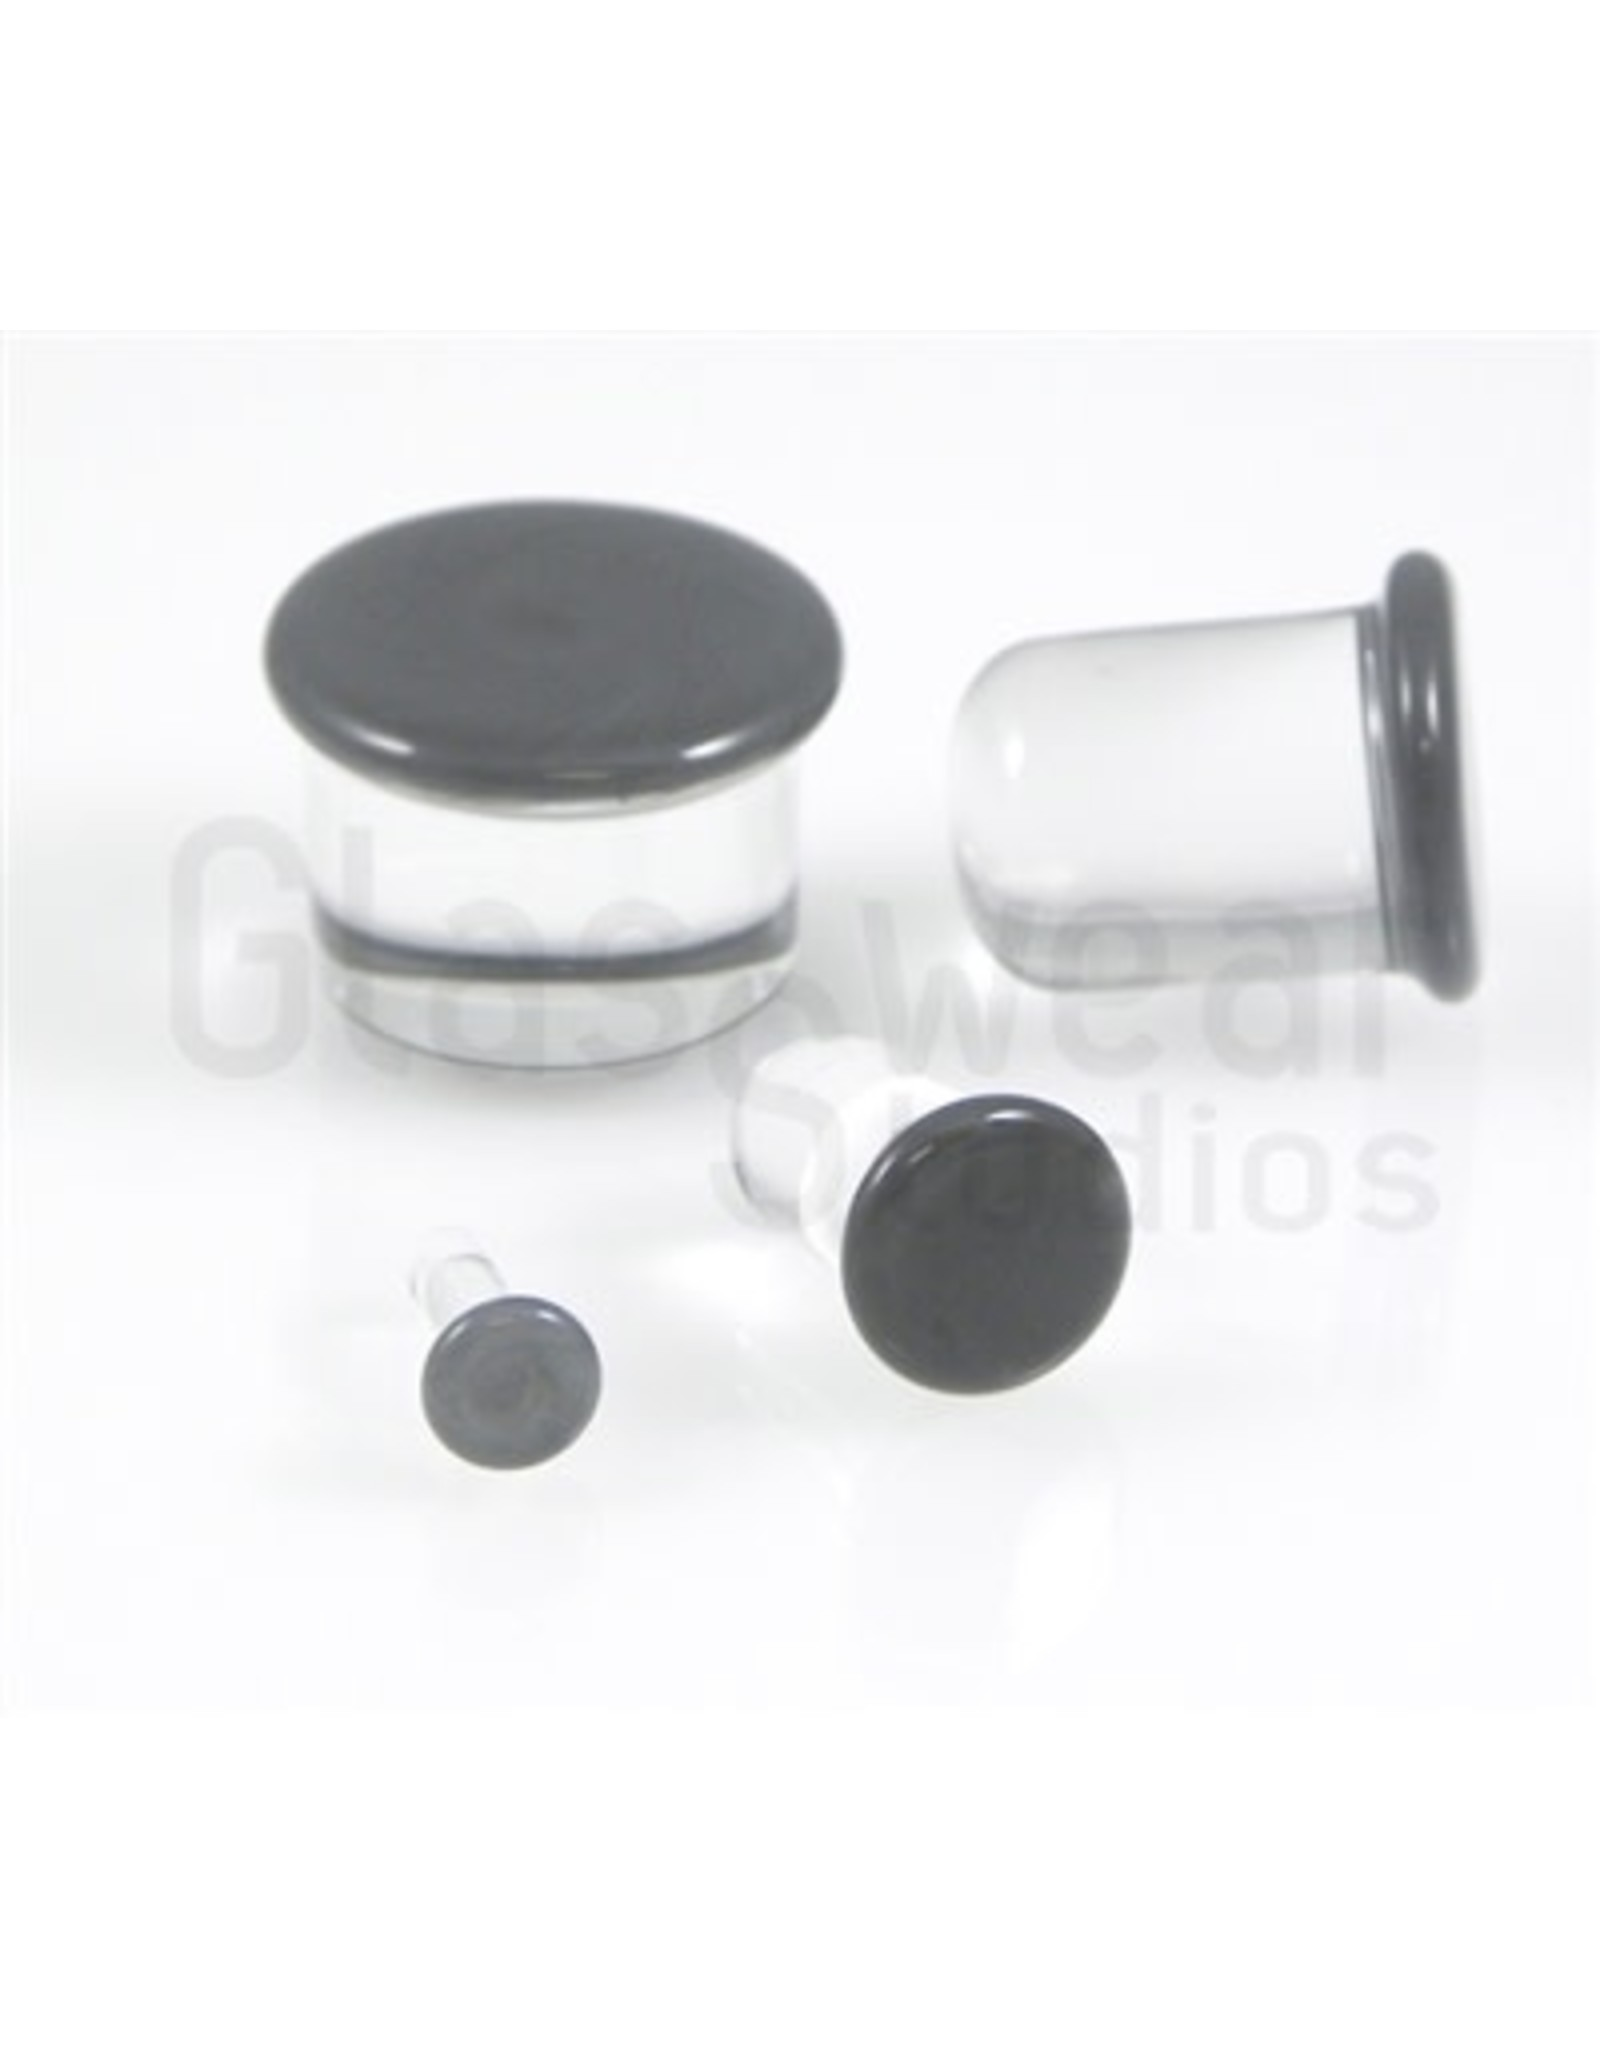 8g SF Glass Plugs